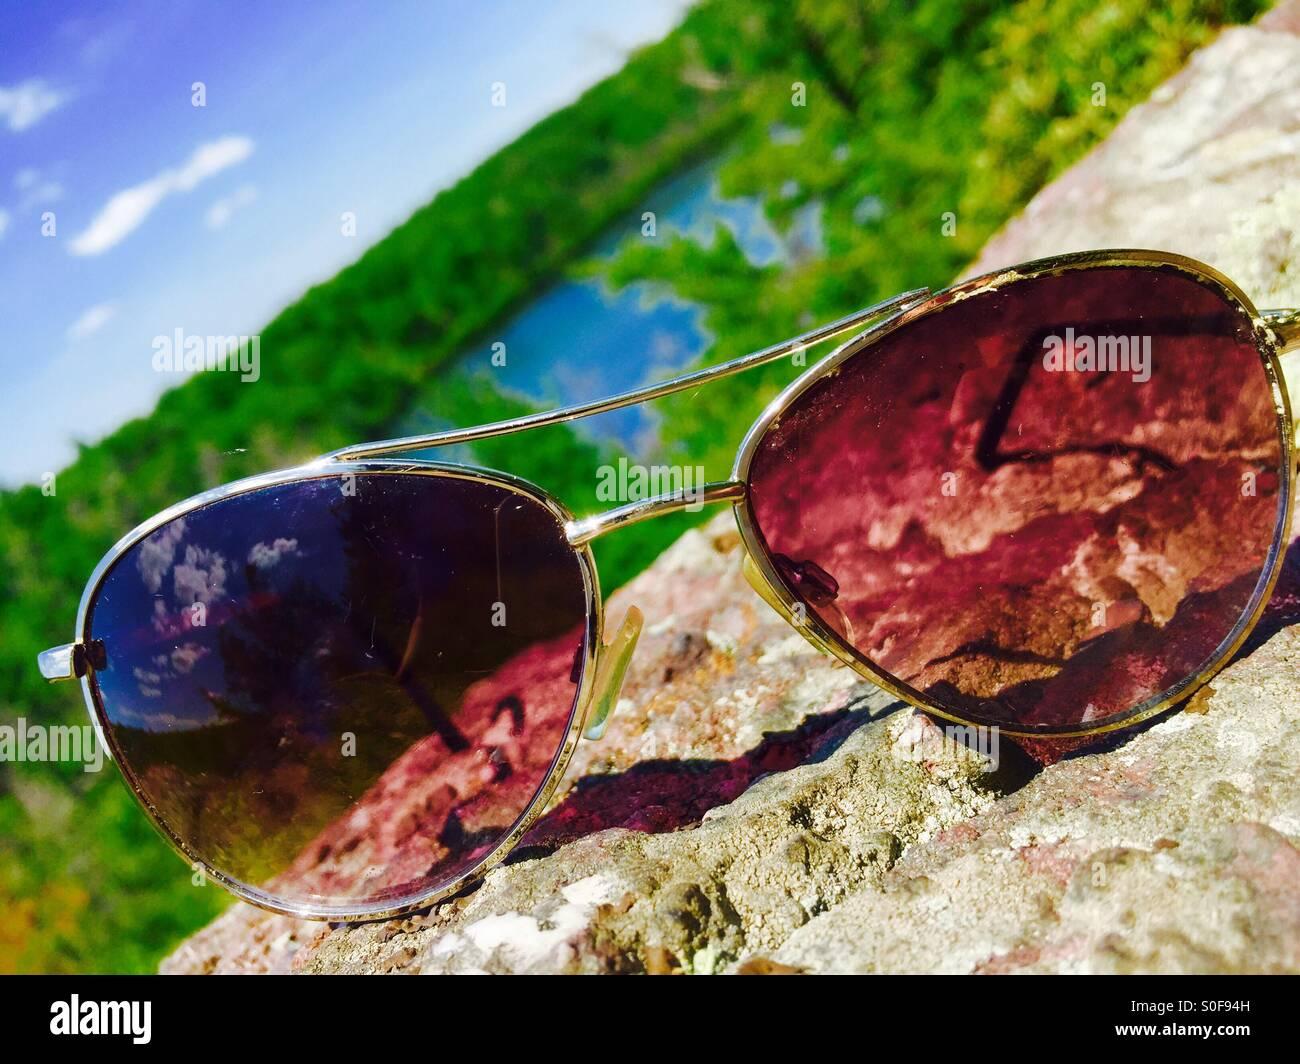 Sunglass View - Stock Image